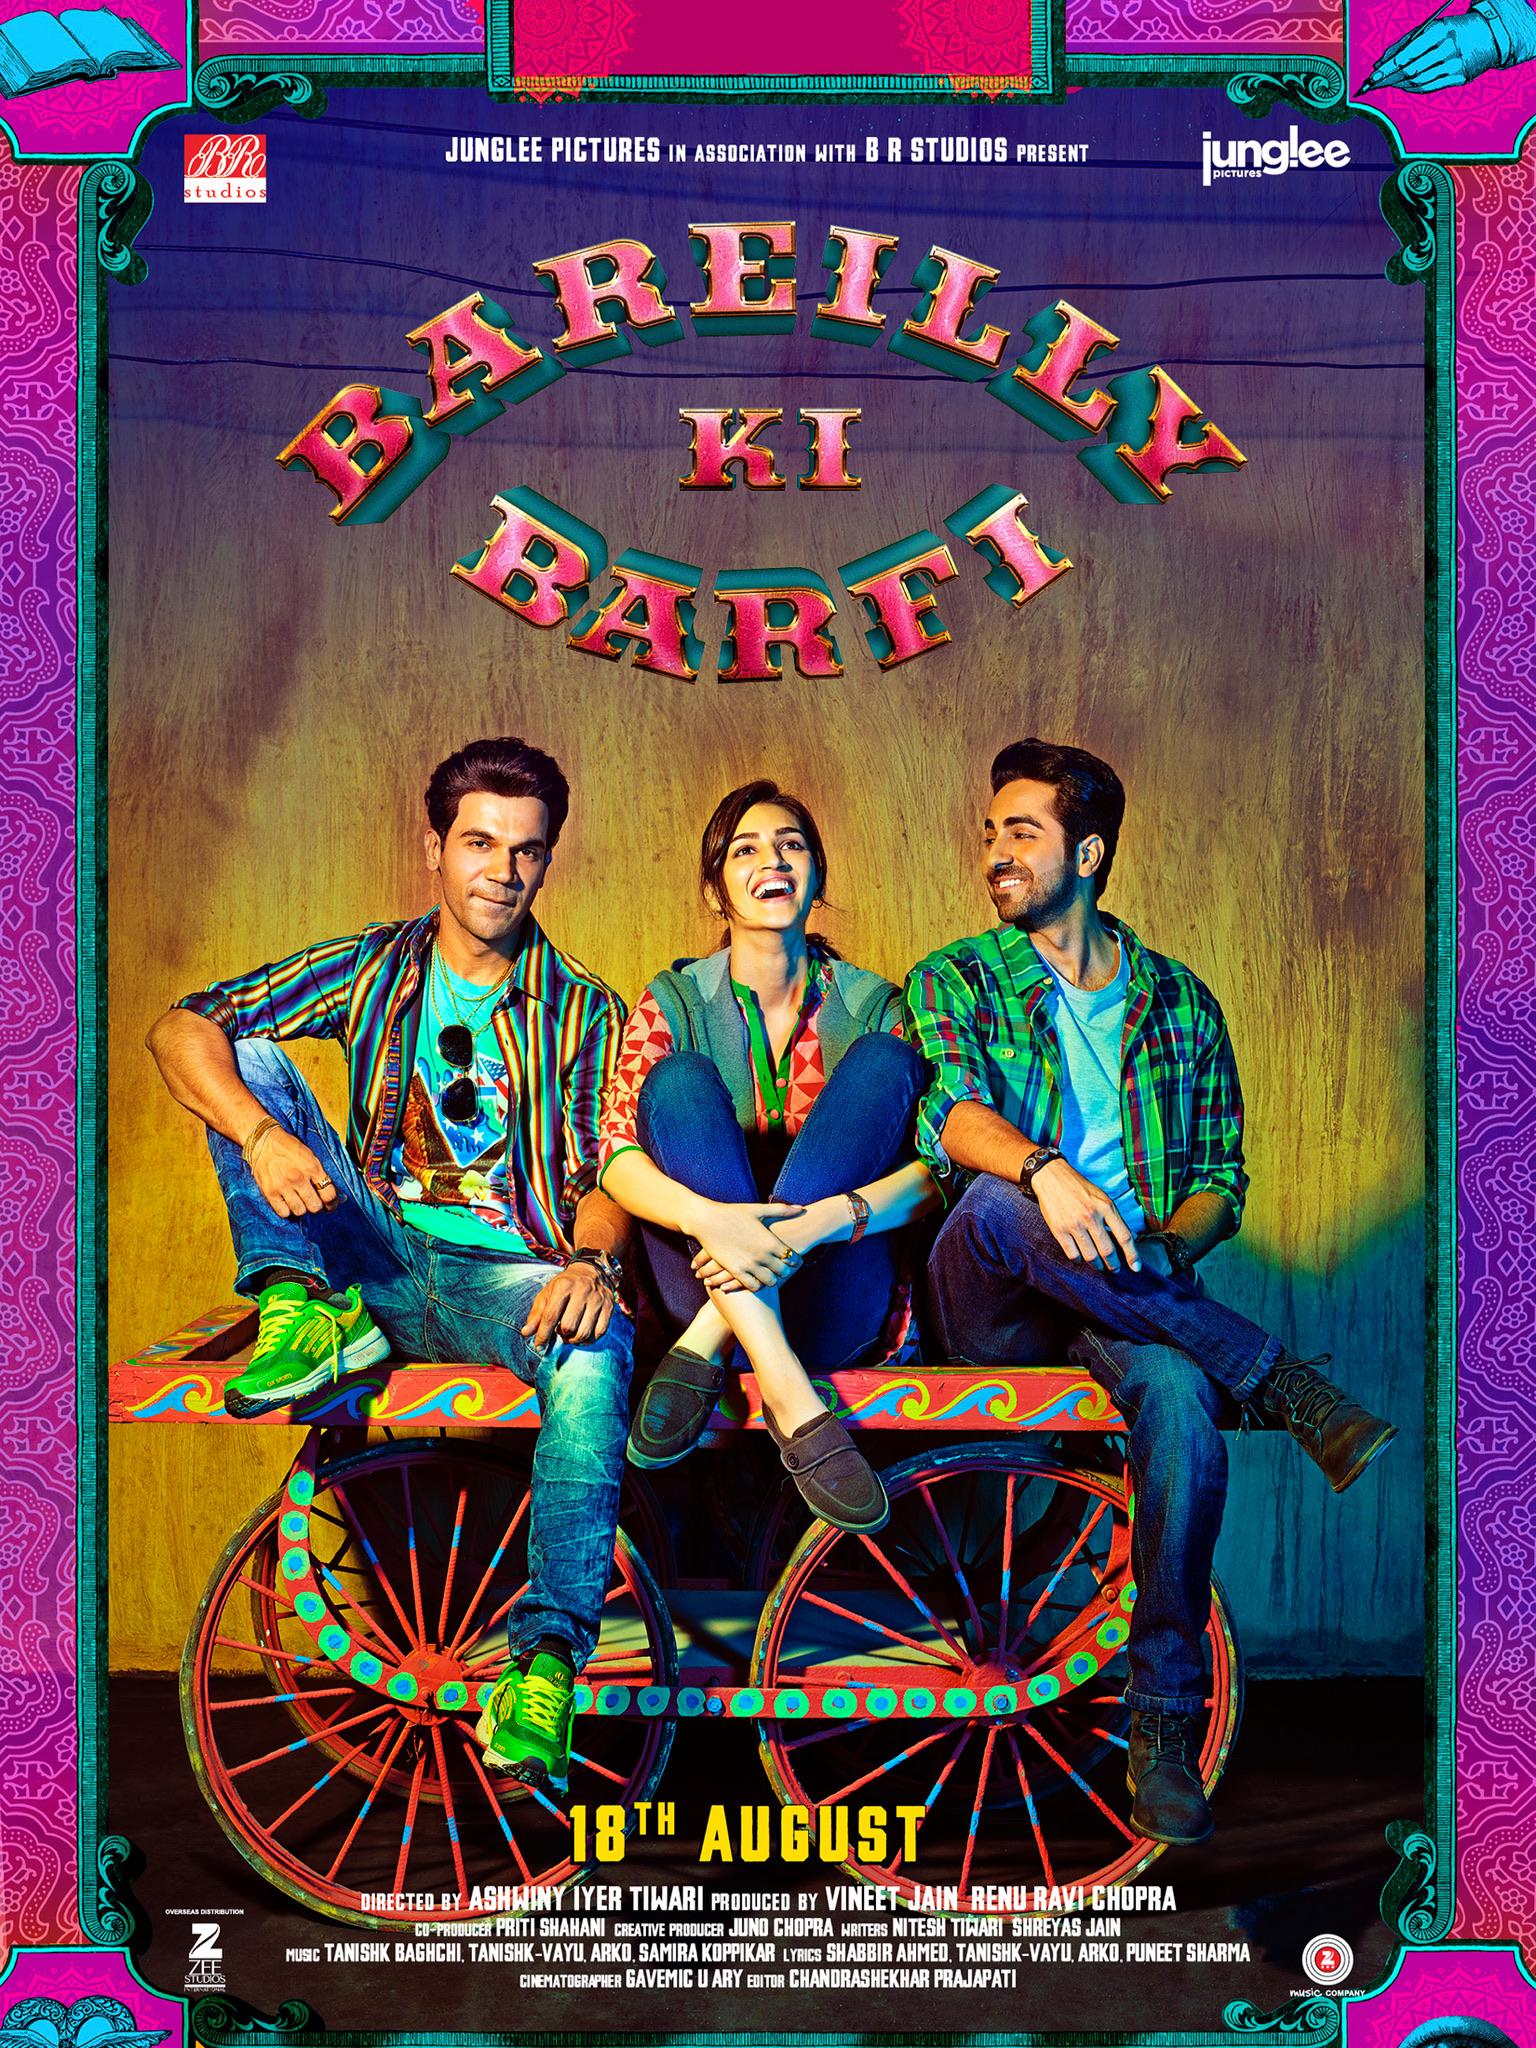 Tiwari magic duo unites, brings us charms of UP with 'Bareilly Ki Barfi'